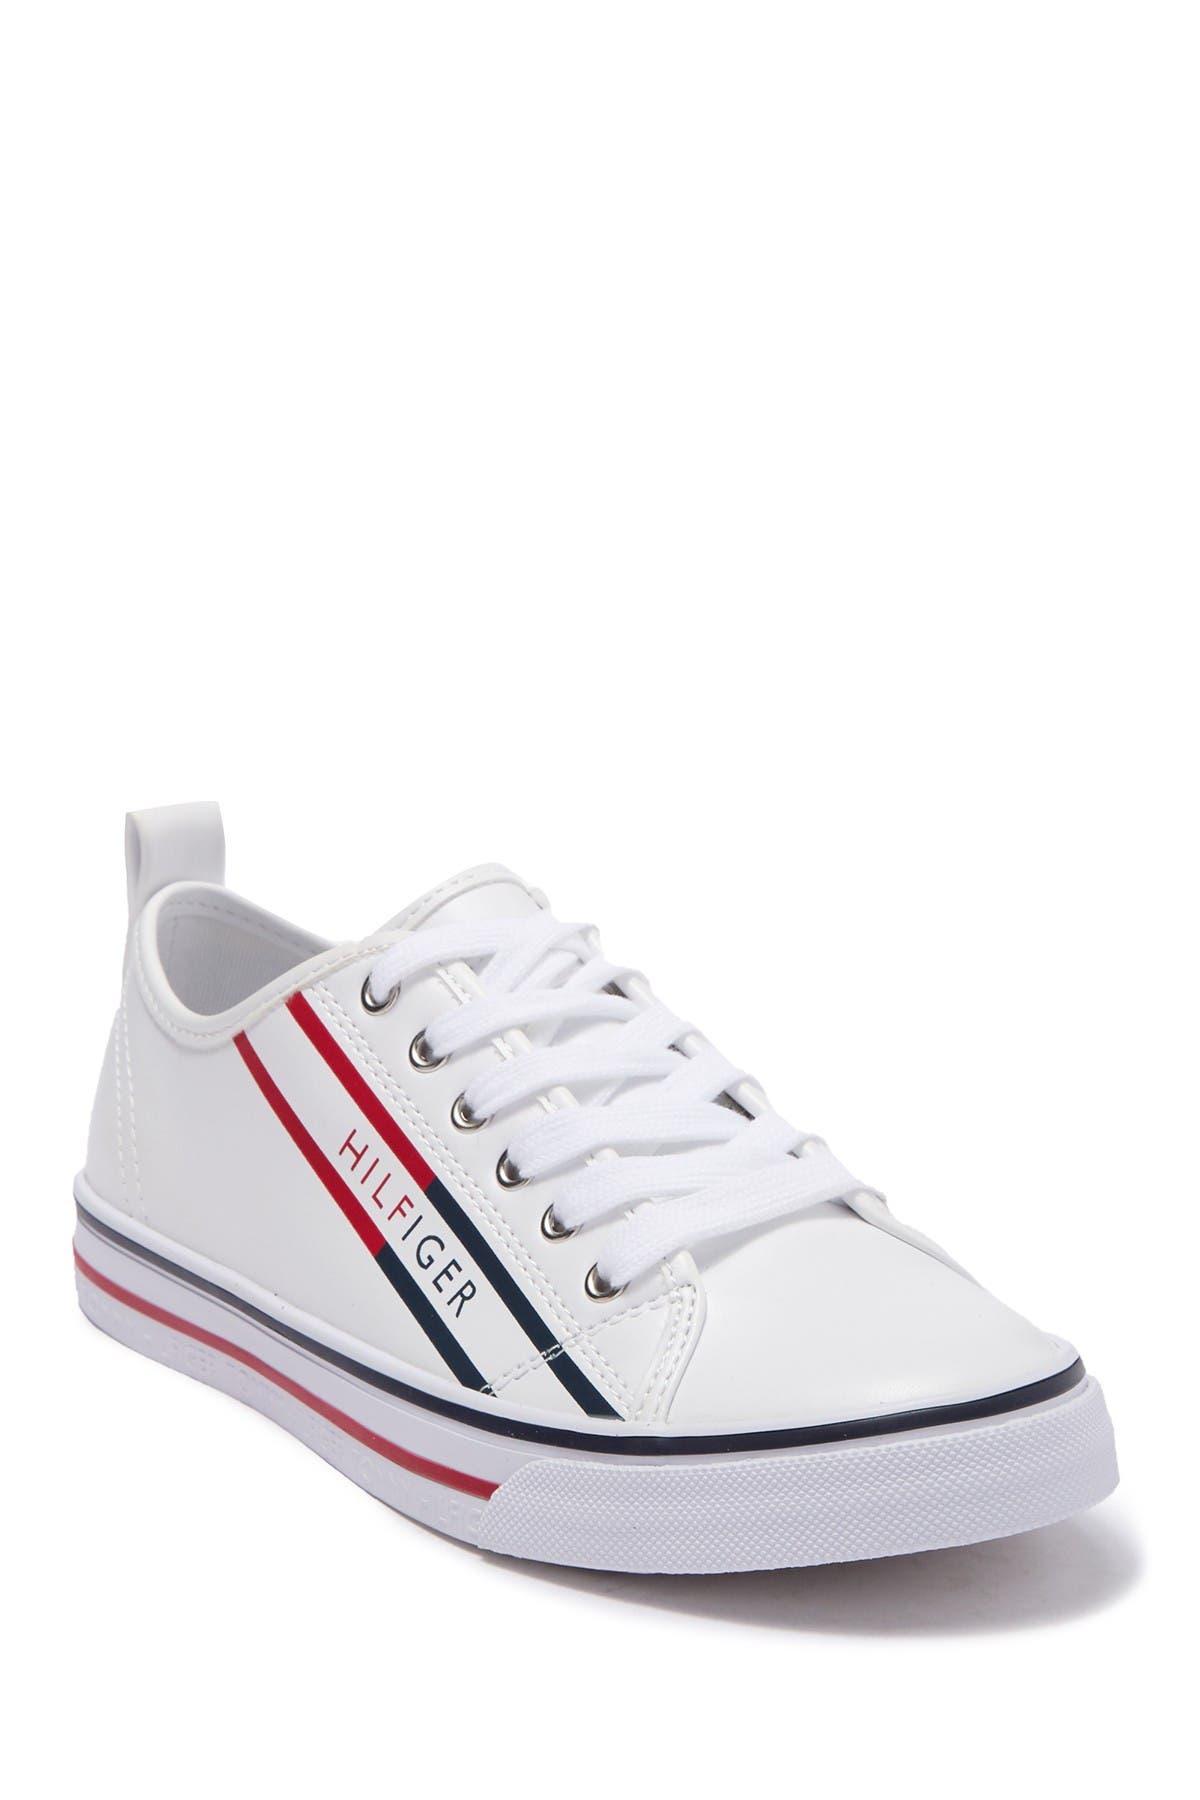 Tommy Hilfiger | Odis 2 Lace Sneaker